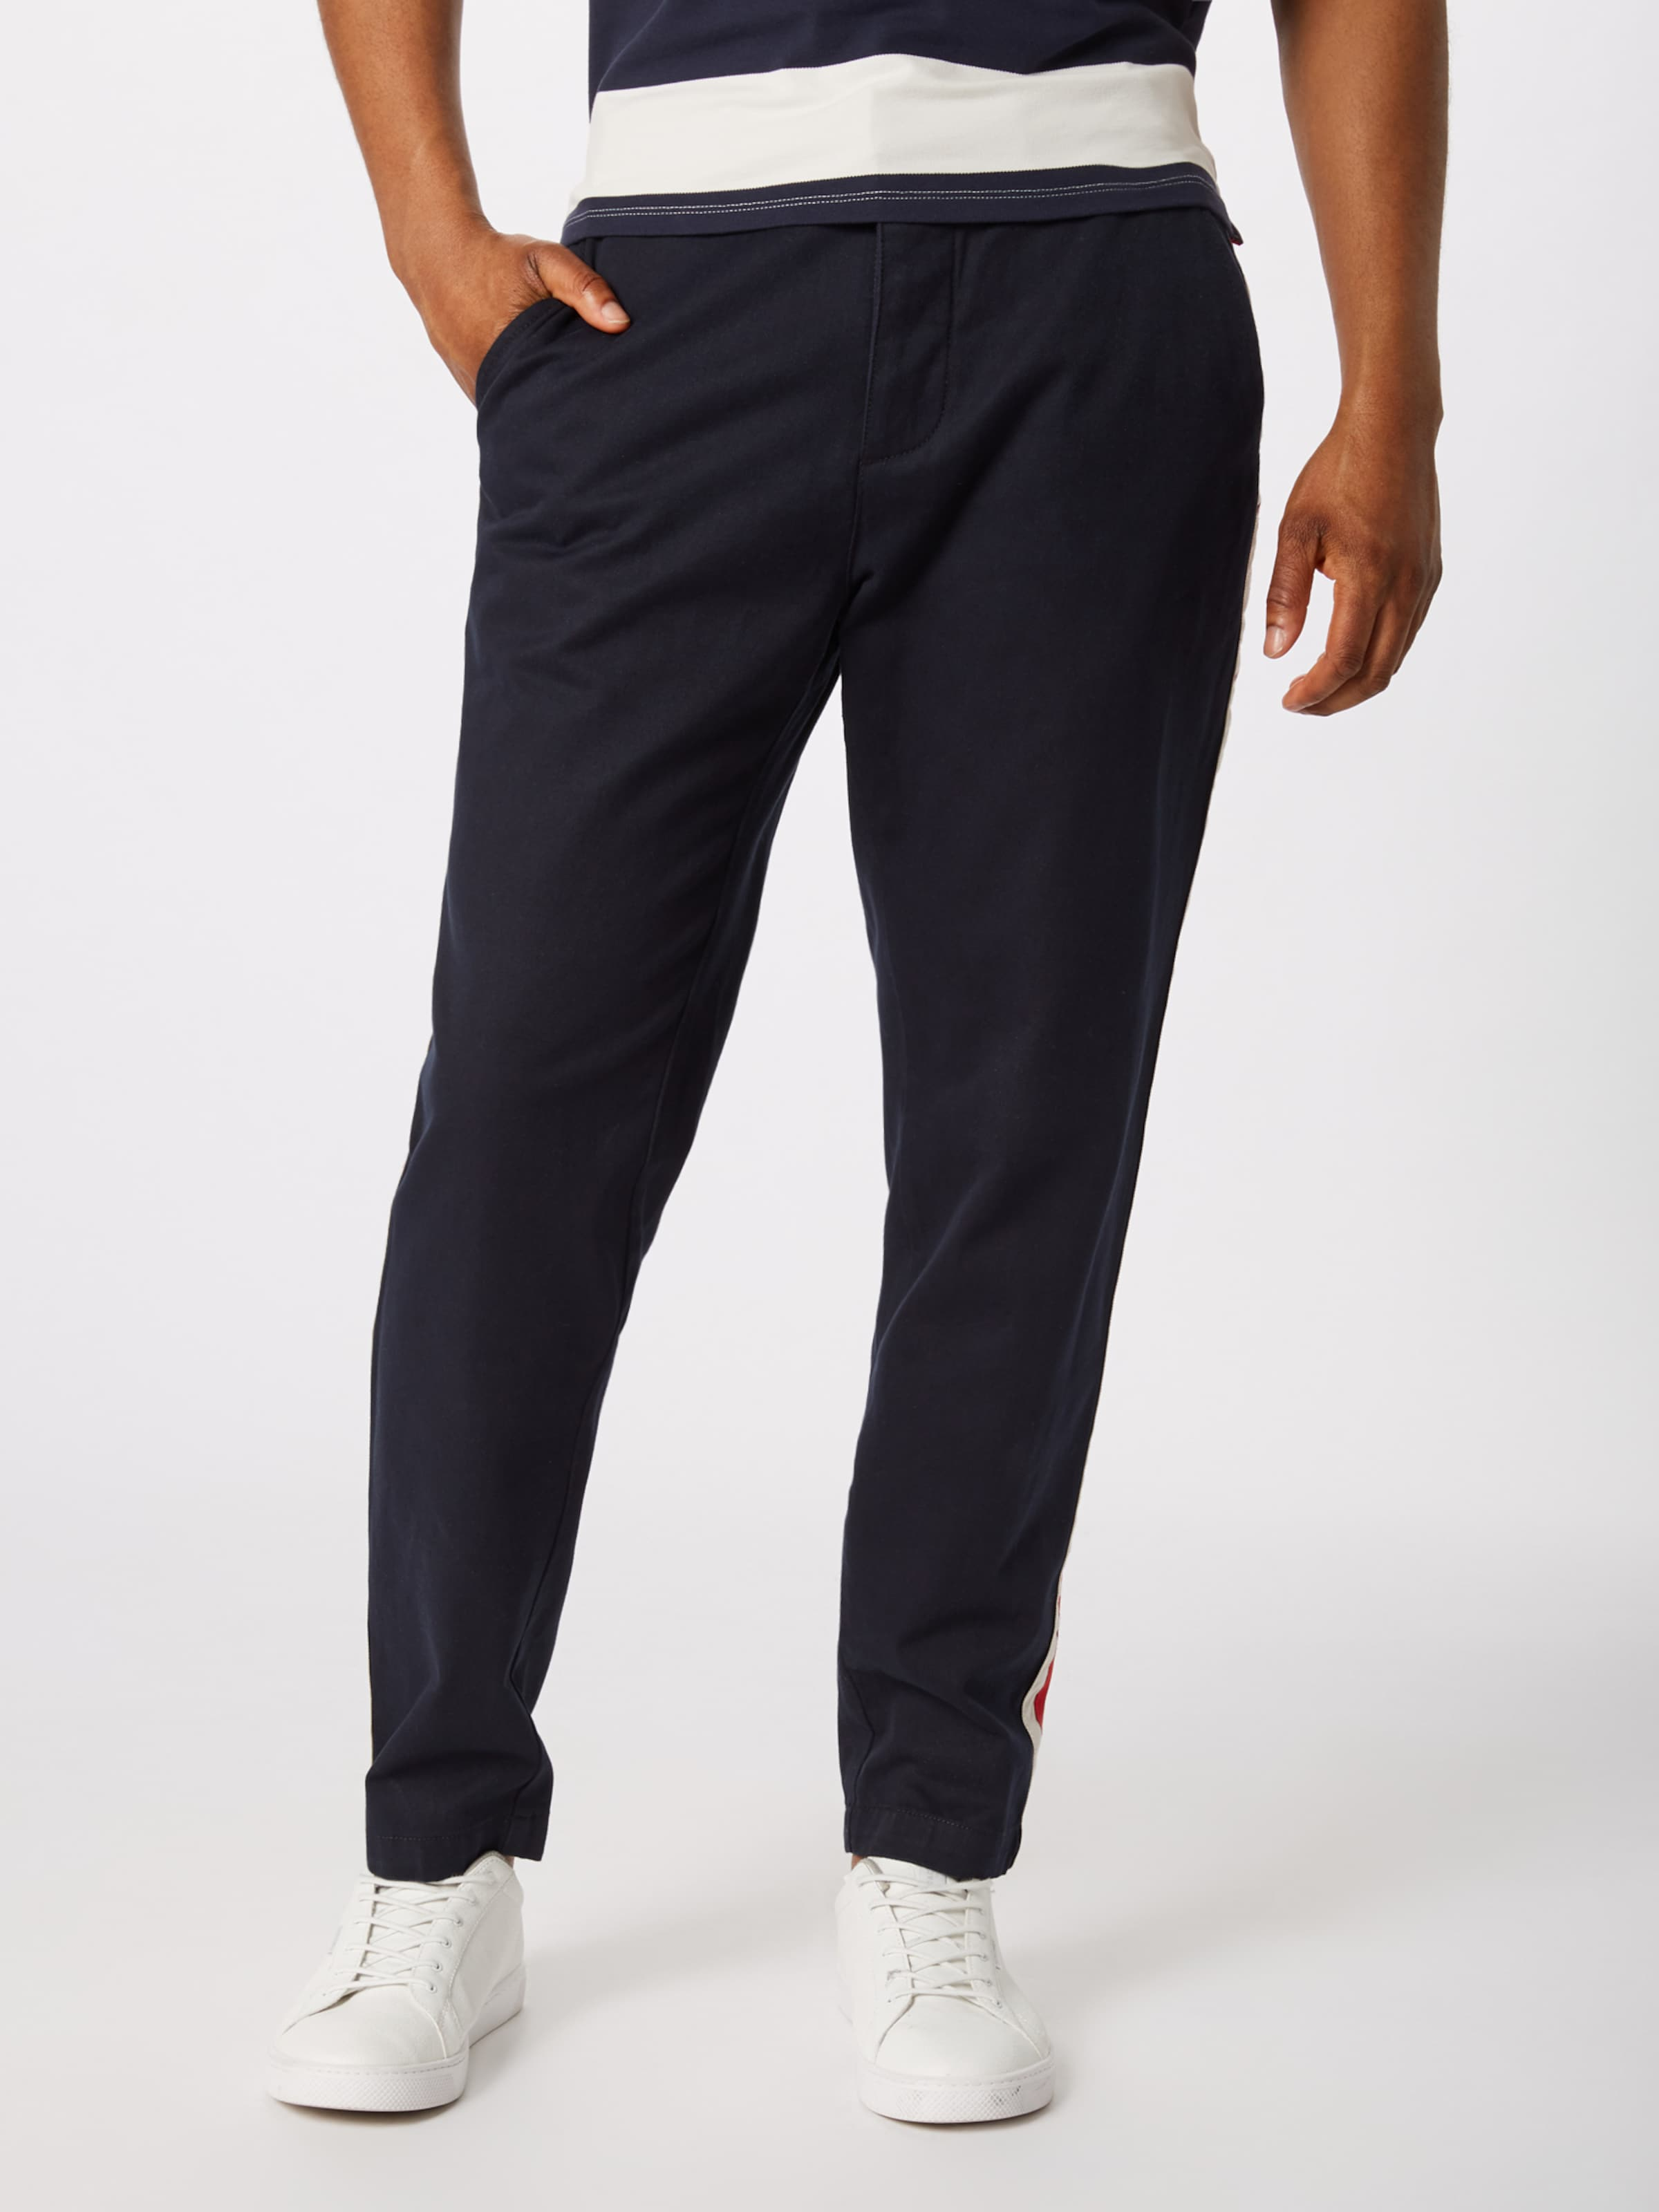 En Pantalon The Marine Kooples 'pantalon' Bleu yNmn0v8wO